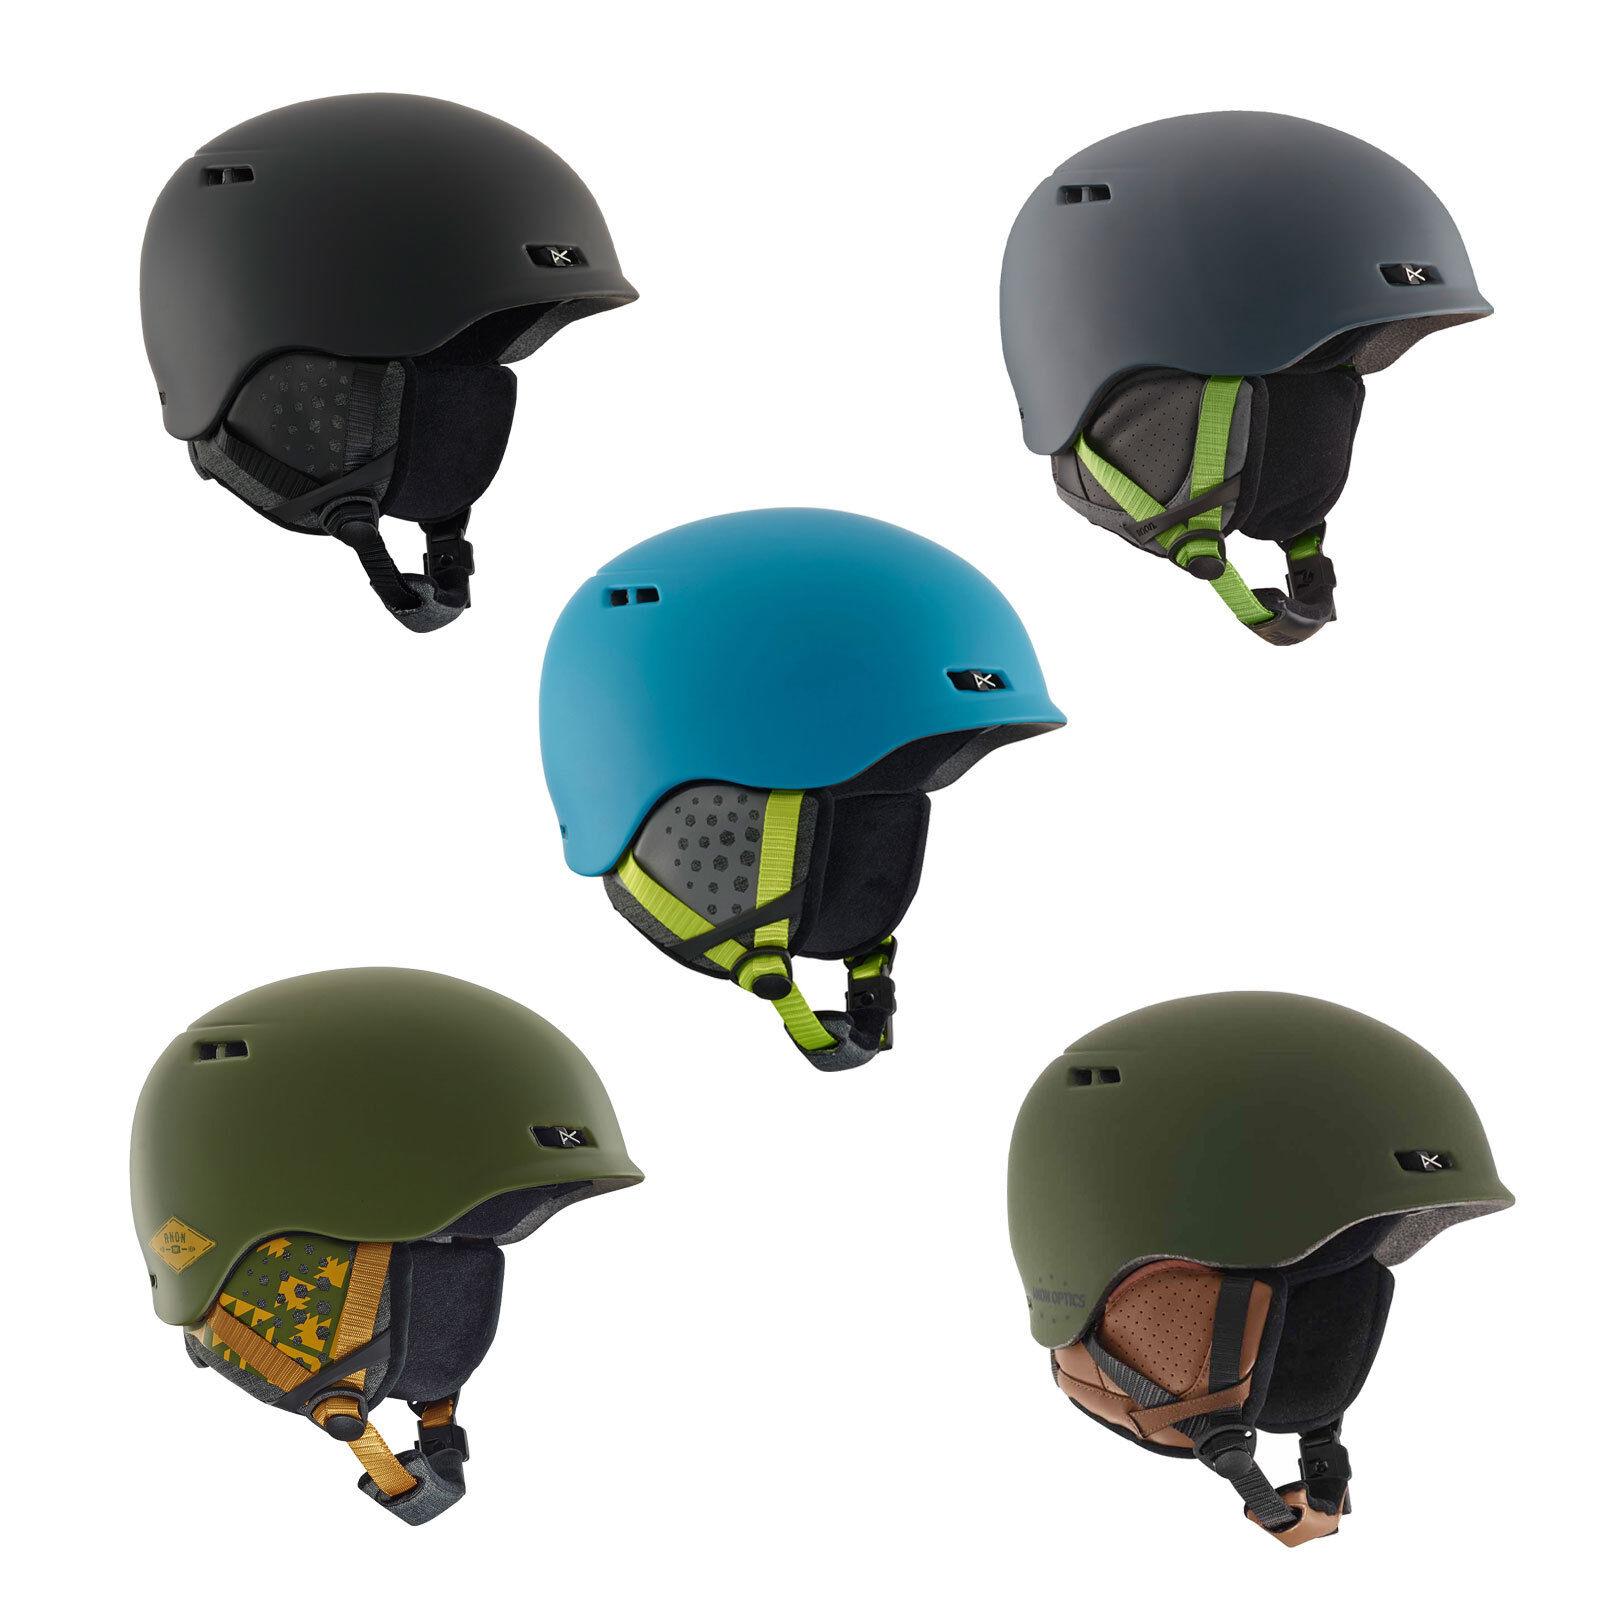 Anon  Rodan Men's Ski Helmet Snowboard Predection New  we take customers as our god